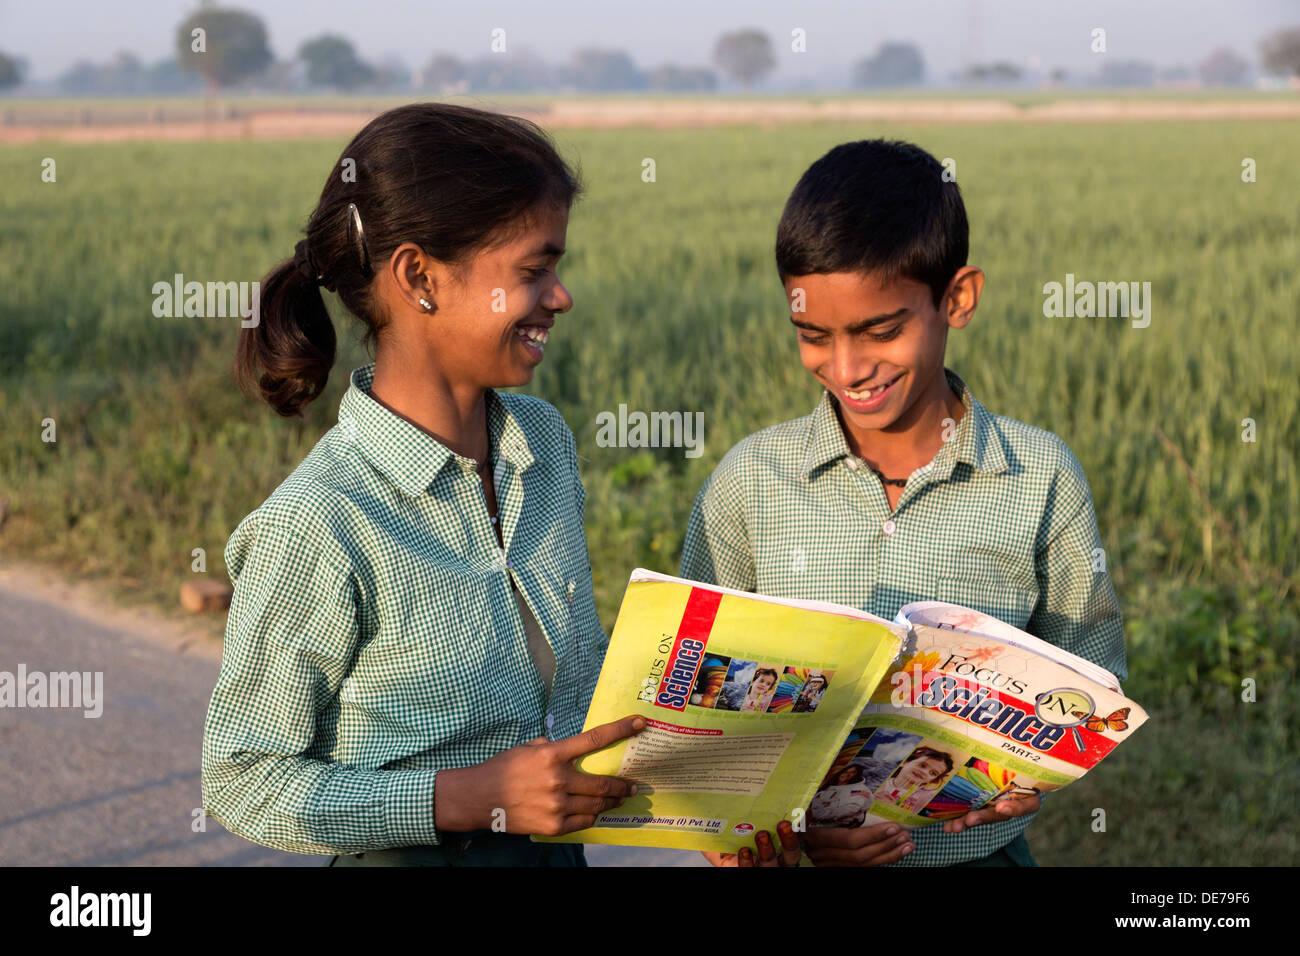 India, Uttar Pradesh, Agra, brother & sister in school uniform looking at indian textbook - Stock Image